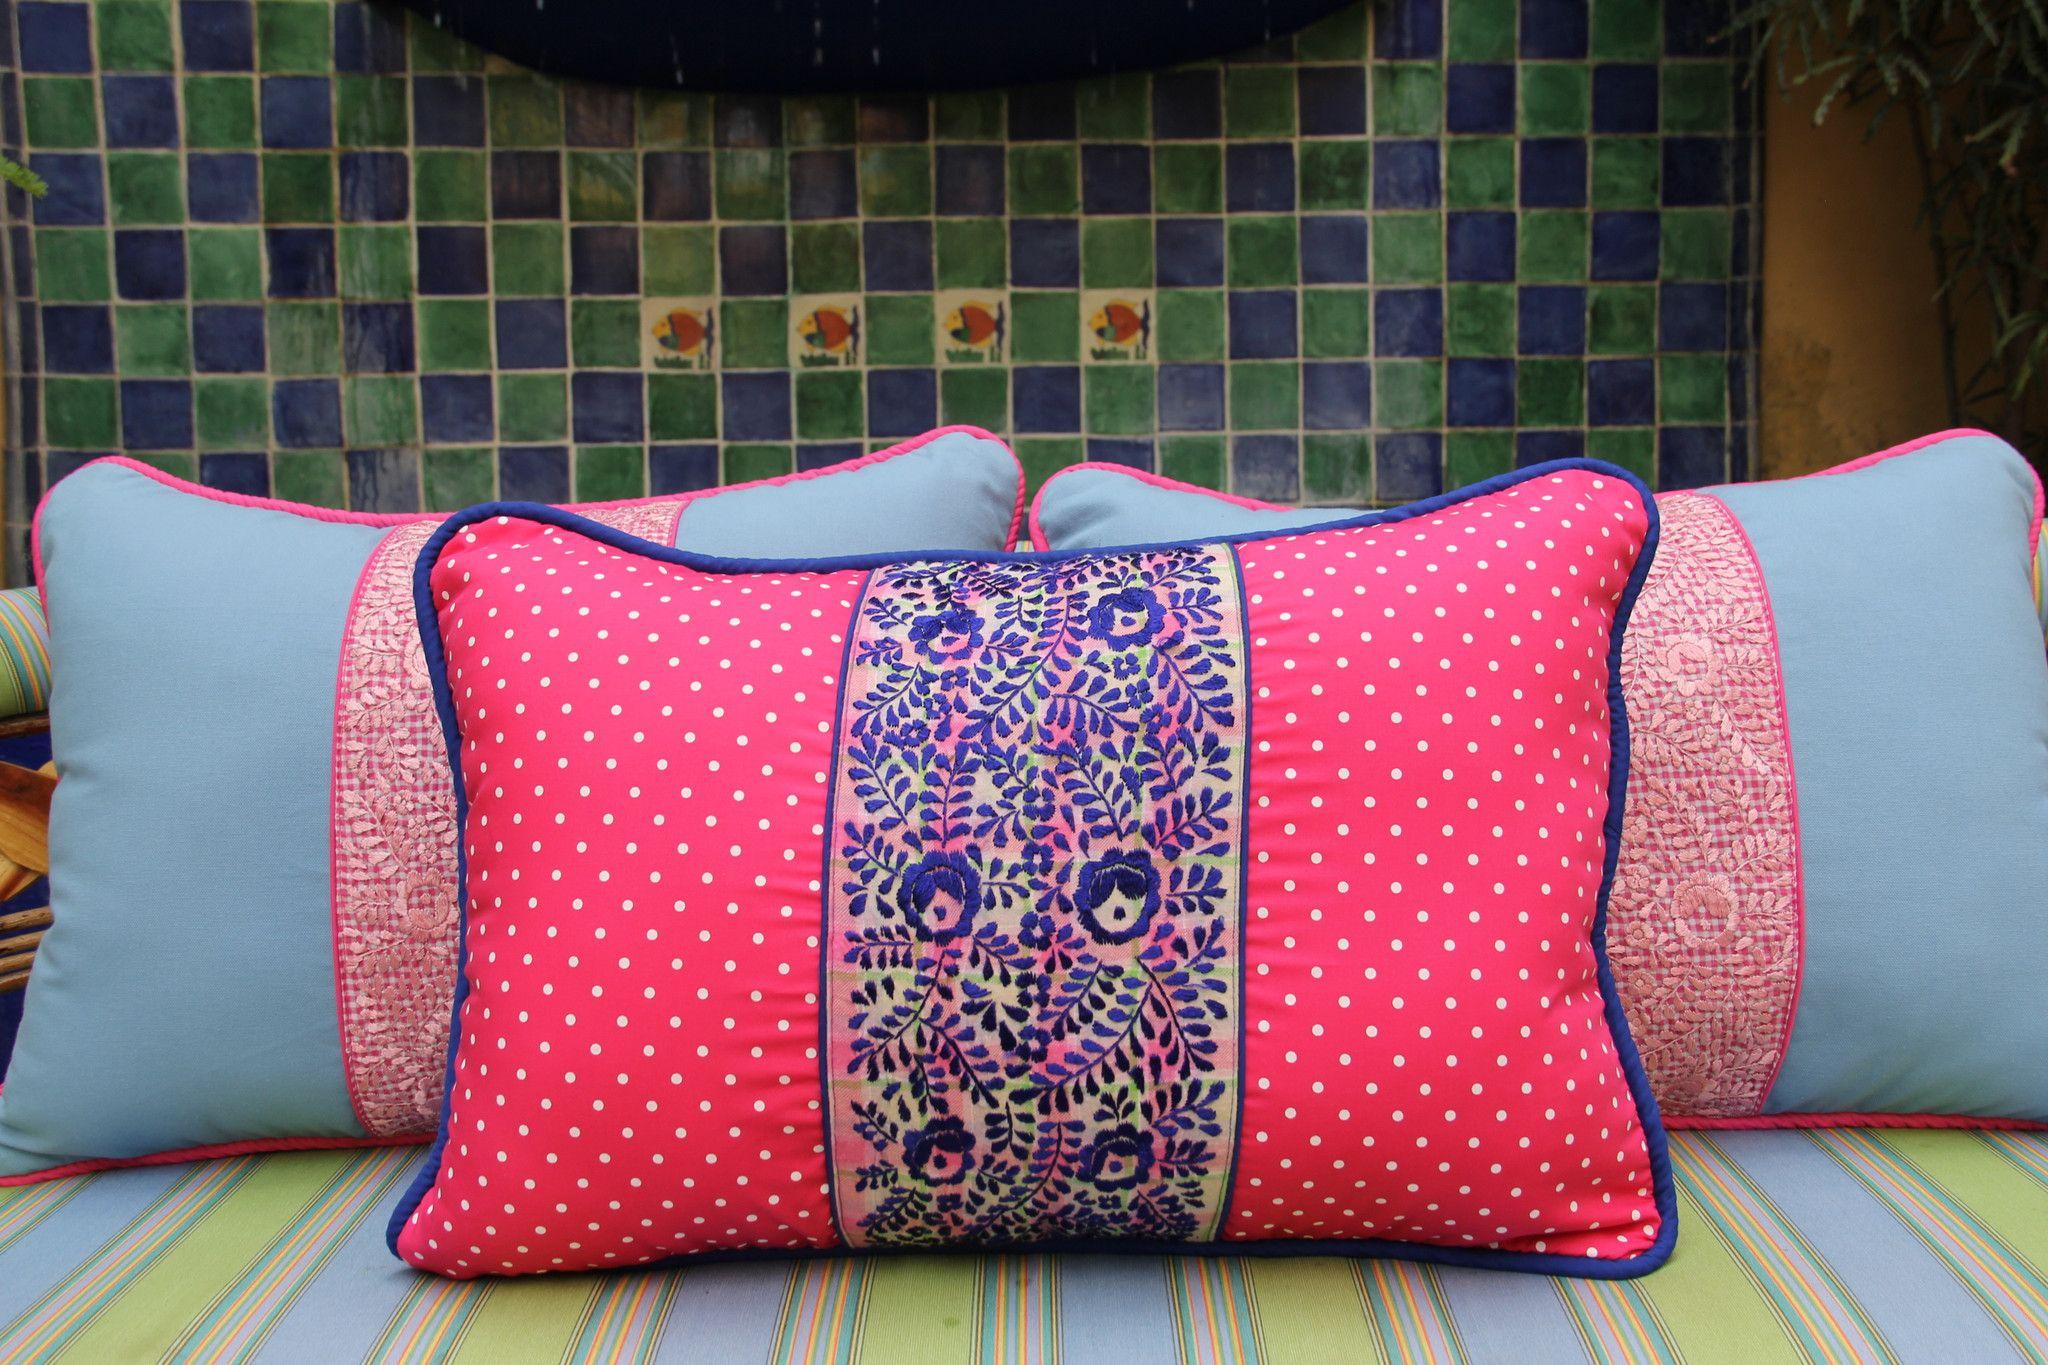 "Fuschisa Polka dots and Cobalt blue hand embroidered sham Scarlett ""O"" – Casa Otomi  Mexico, Tenango, wedding, textile, mexican suzani, embroidery, hand embroidered, otomi, fiber art, mexican, handmade,  casa, decor, interior, frida, kahlo, folk,  folk art, house, home, puebla, las flores, cushion, serape, preppy, gingham, polka dots, pink, lime, green, lily pulitizer, pouf, elle decor, boho, style, bestey johnson, lily pultizer, interior, stripes, southern living, southern style,"